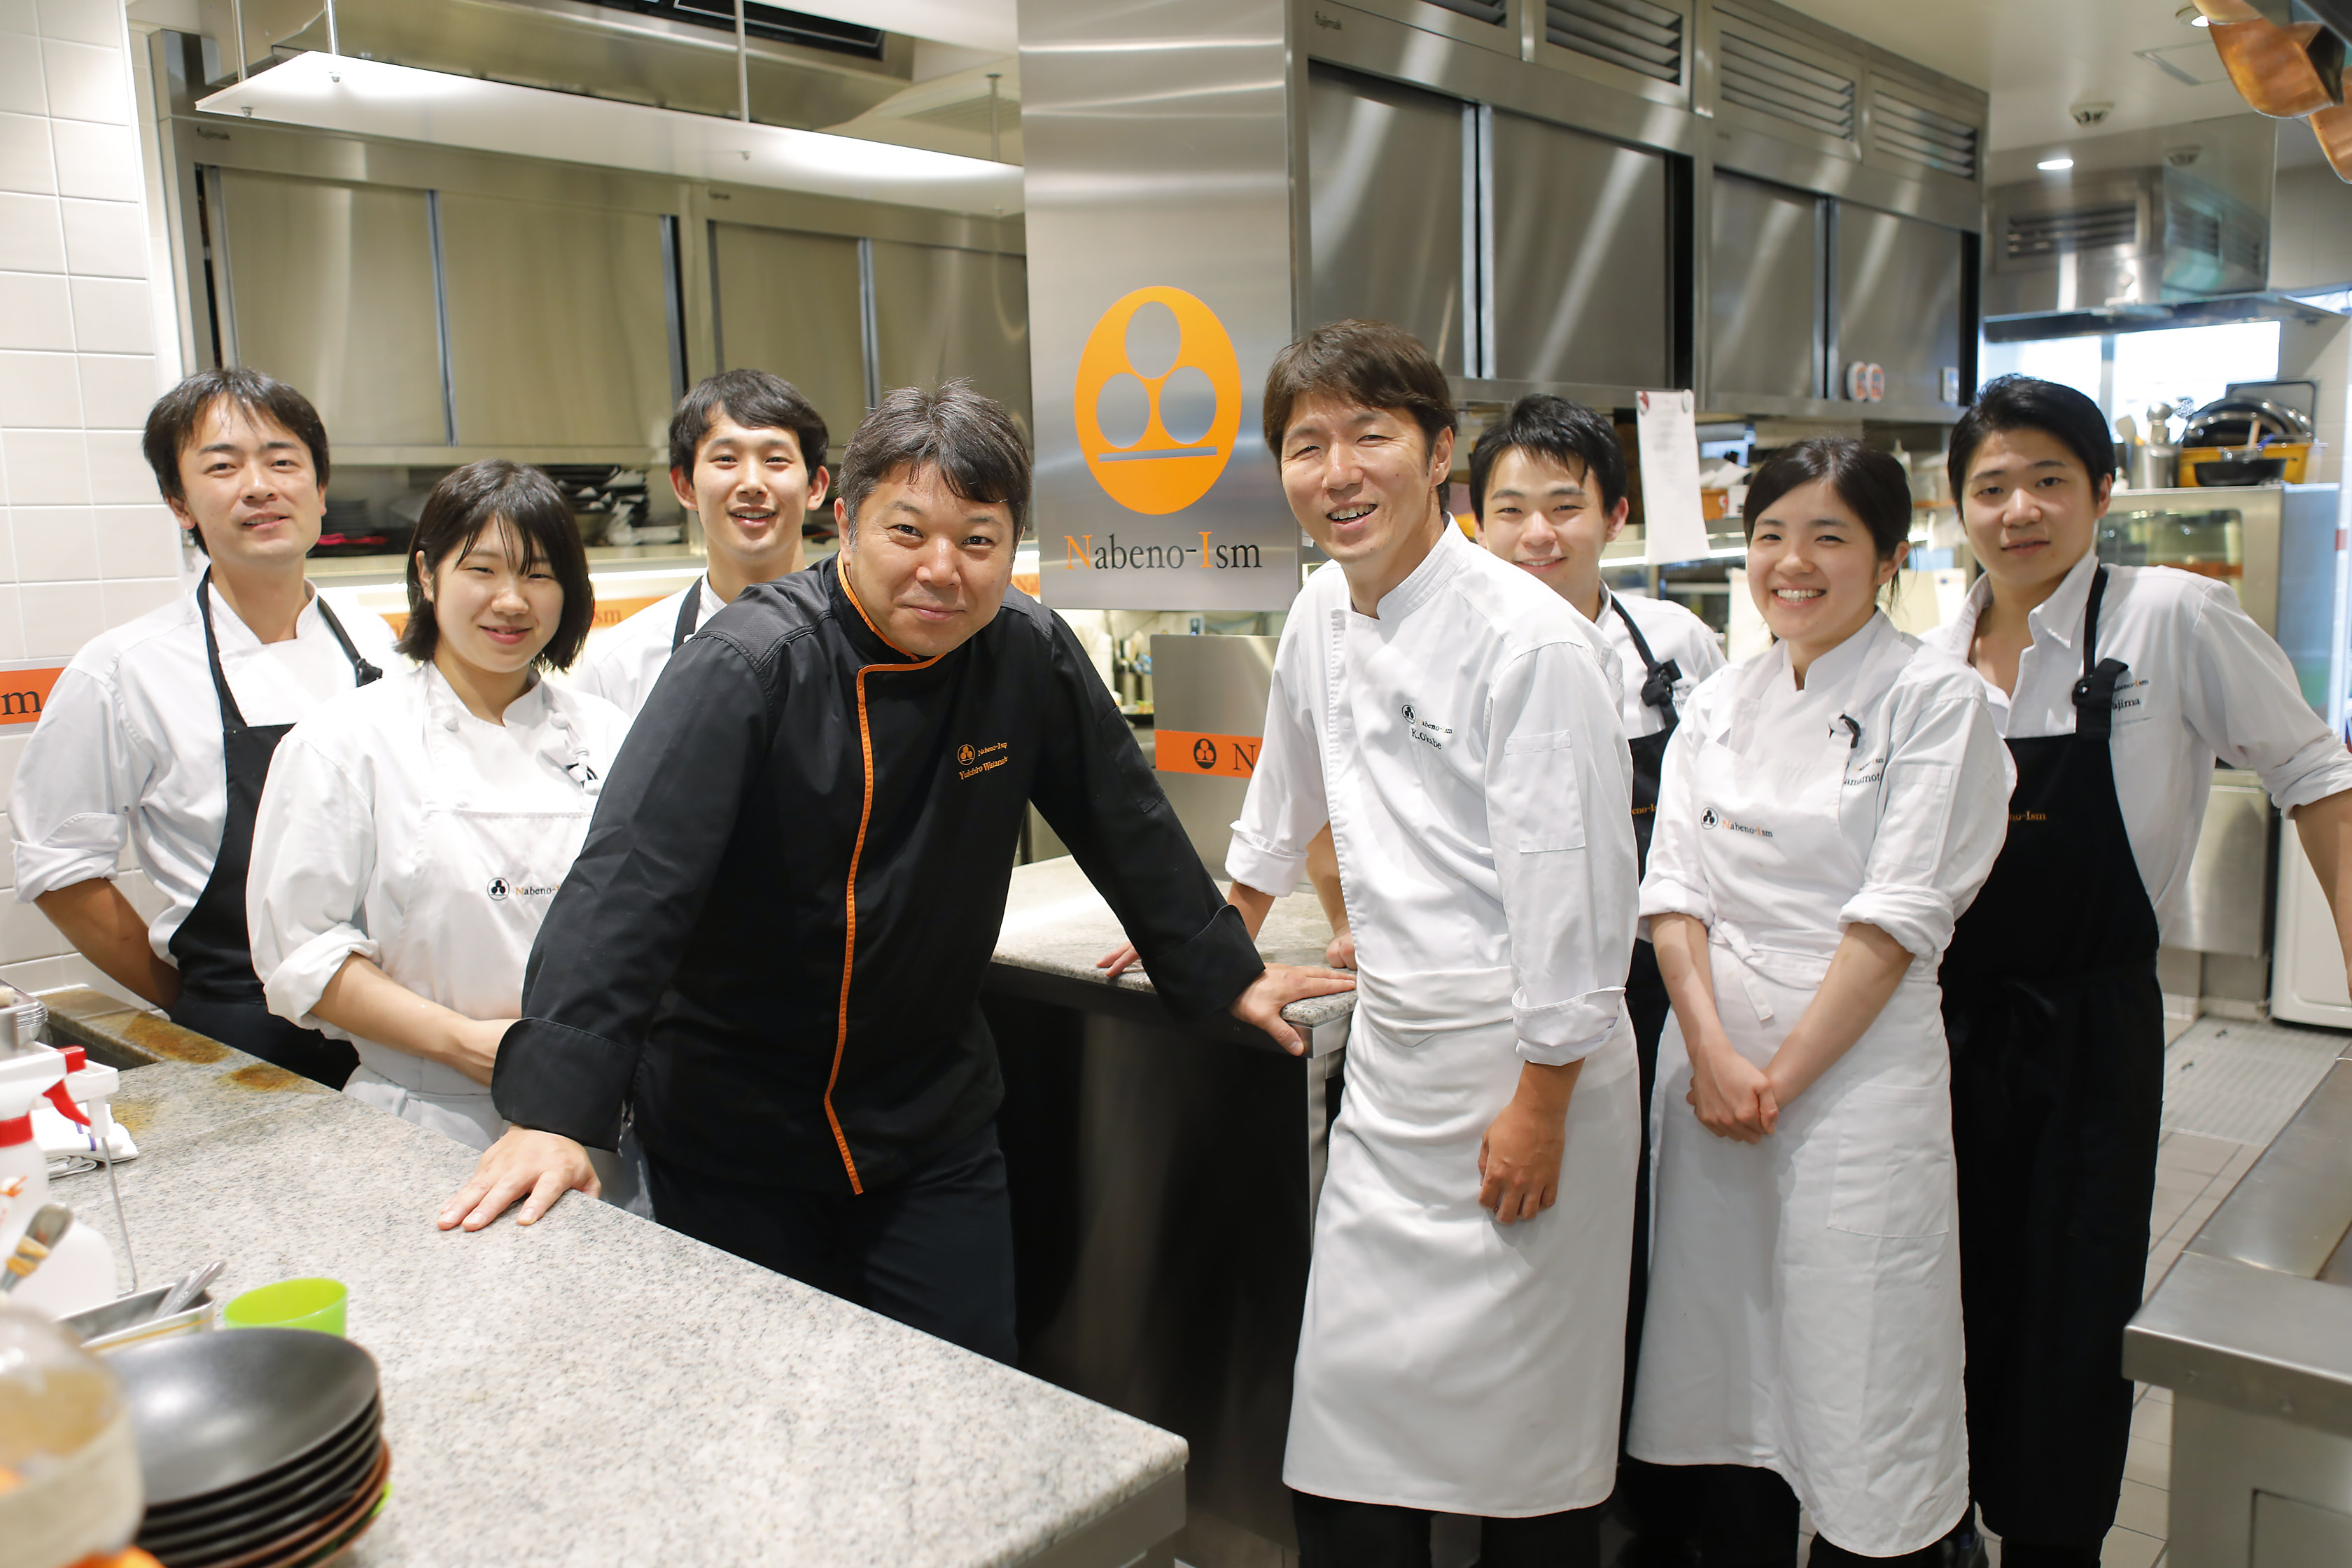 Nabeno-Ism Yuichiro Watanabe & staffs